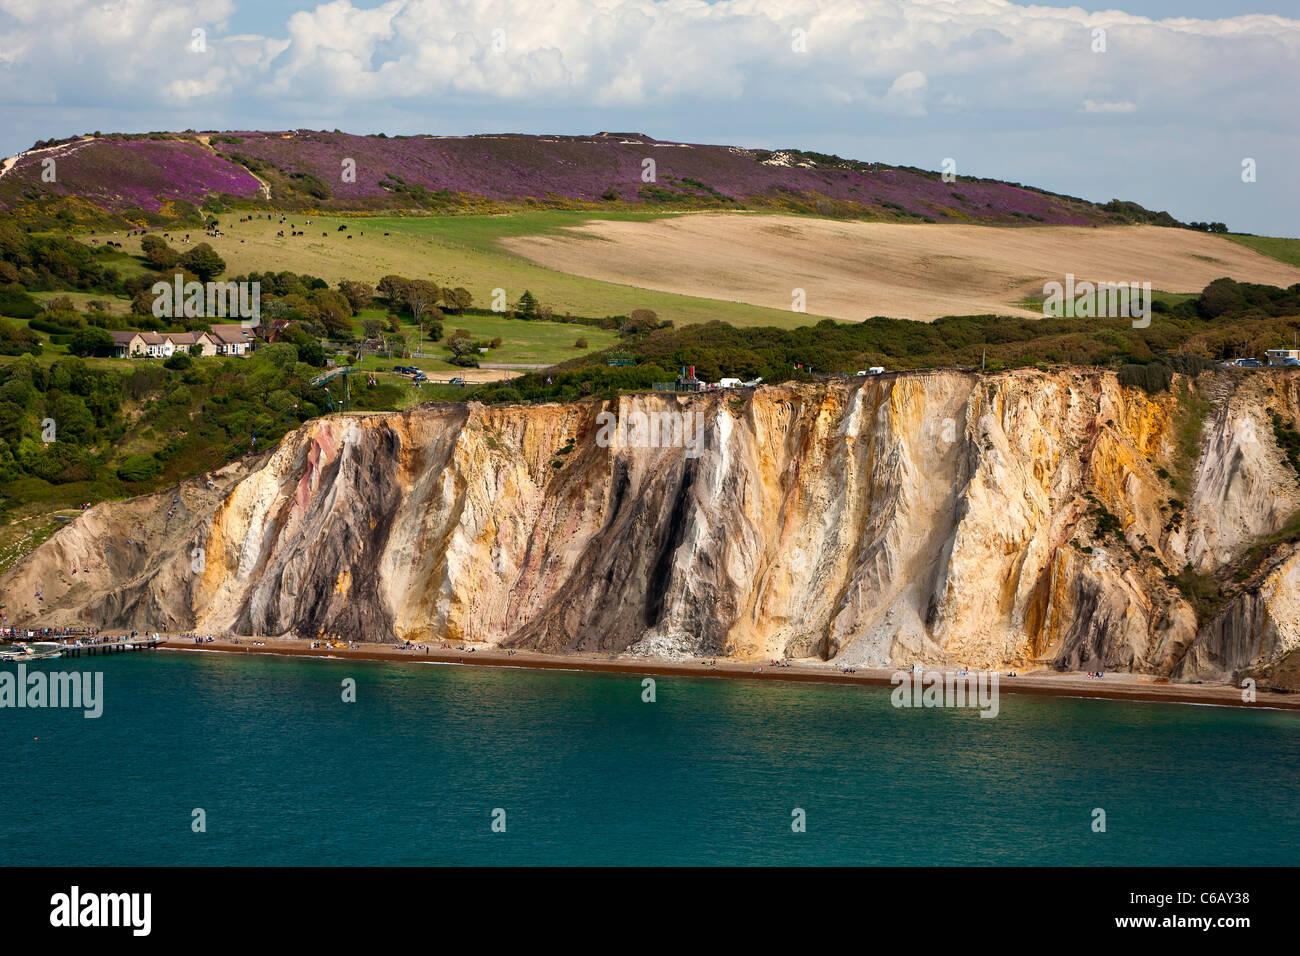 Alum Bay Isle of Wight England Großbritannien Stockfoto